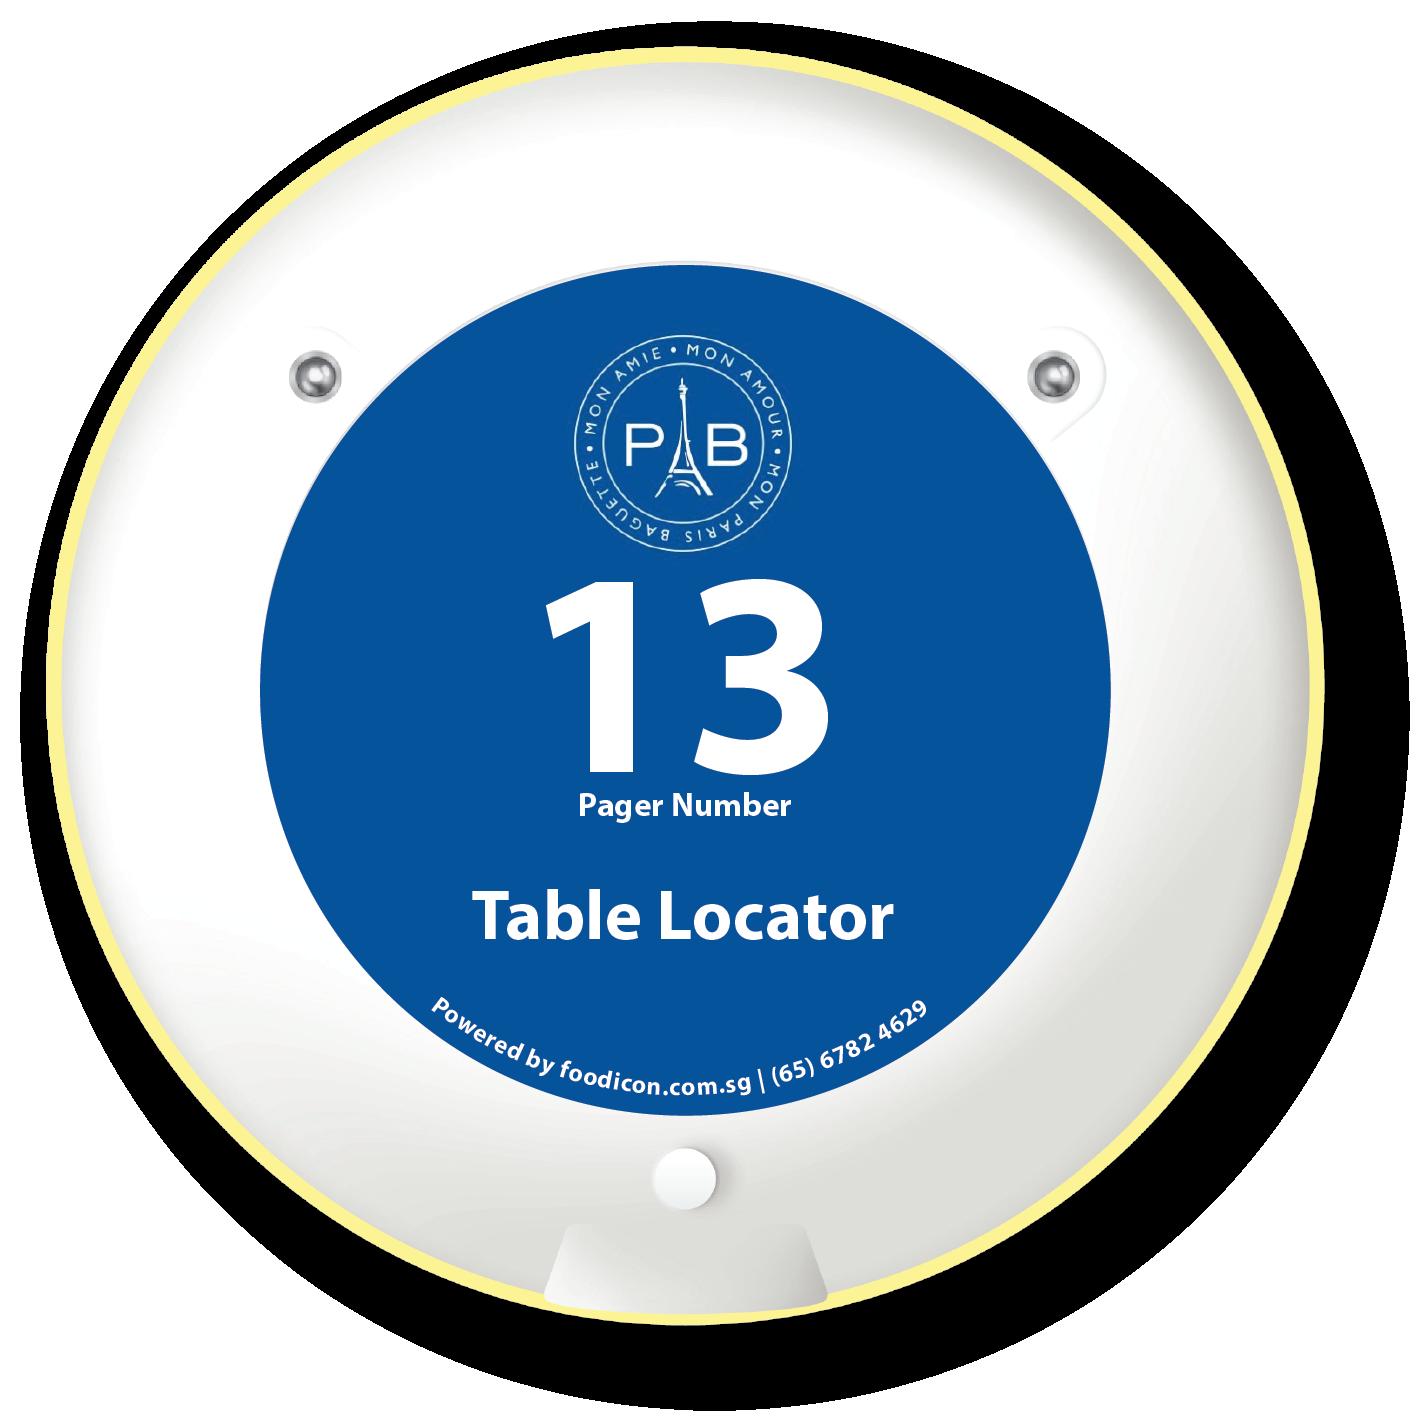 Food Icon Paging System - Paris Baguette